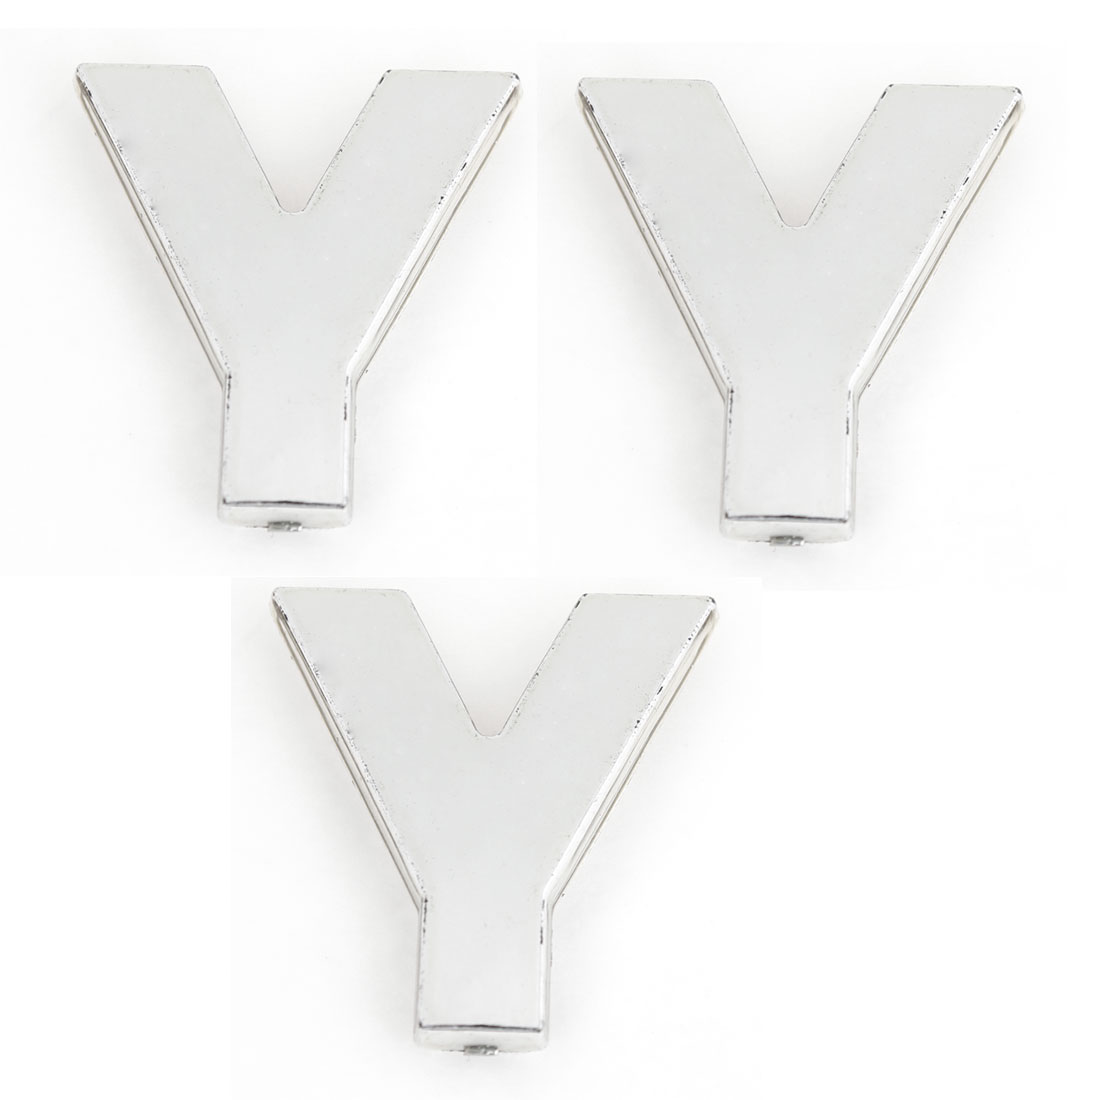 3PCS Self Adhesive Letter Y Car Vehicle 3D Emblem Badge Ornament Silver Tone